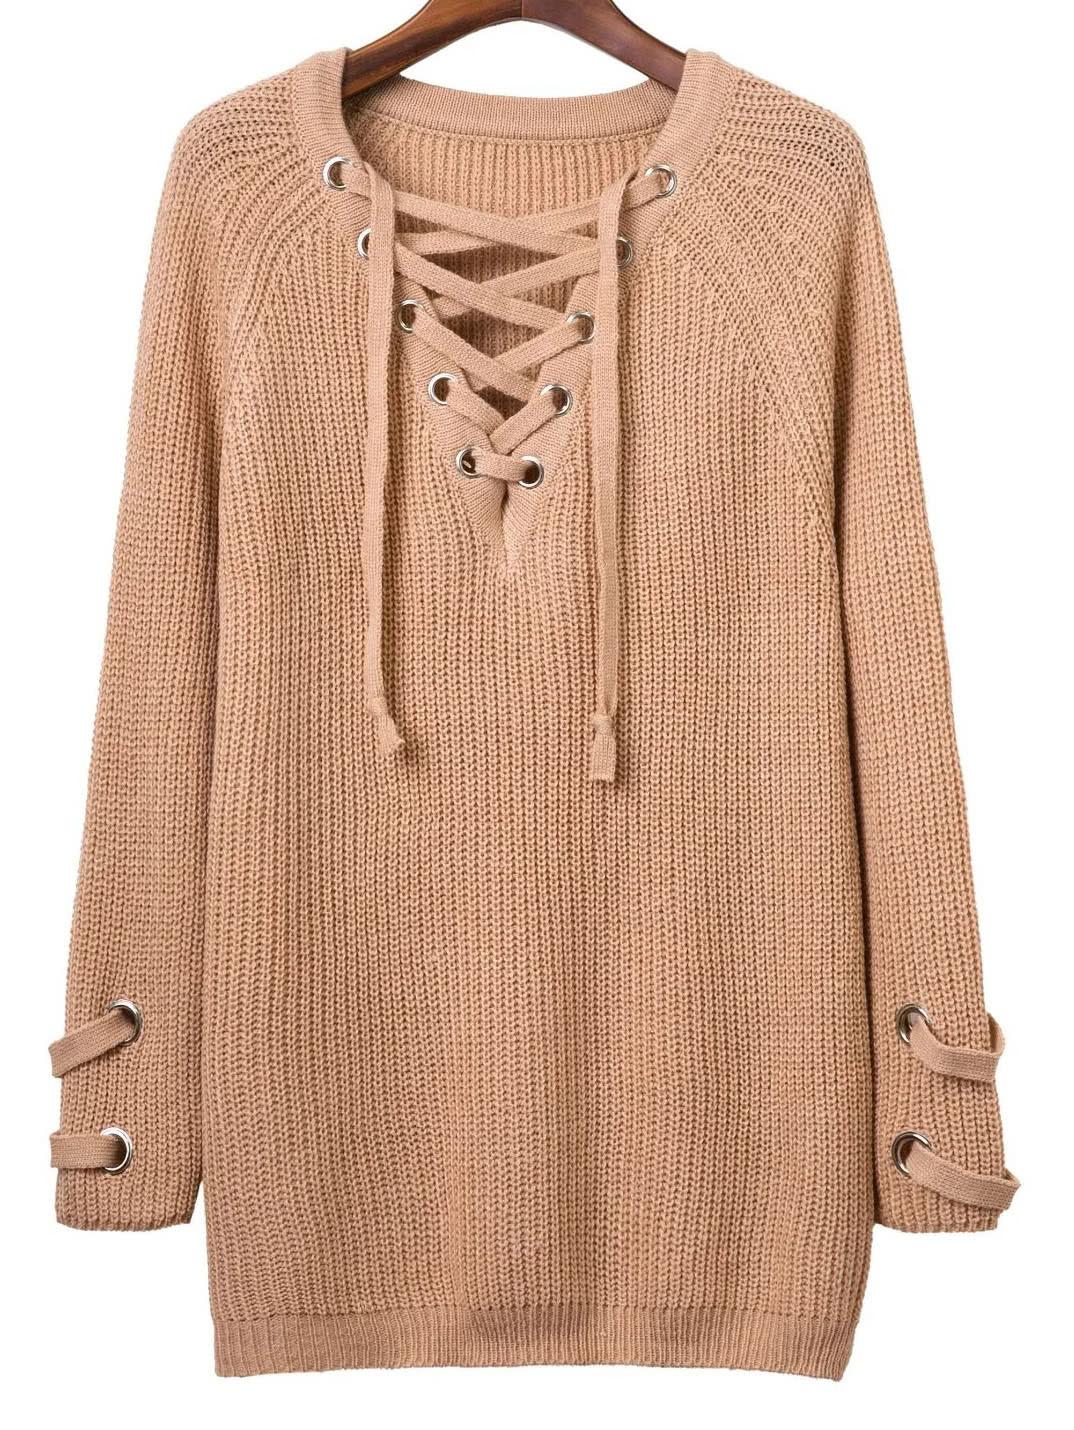 Фото Grommet Lace Up V Cut Knit Dress. Купить с доставкой